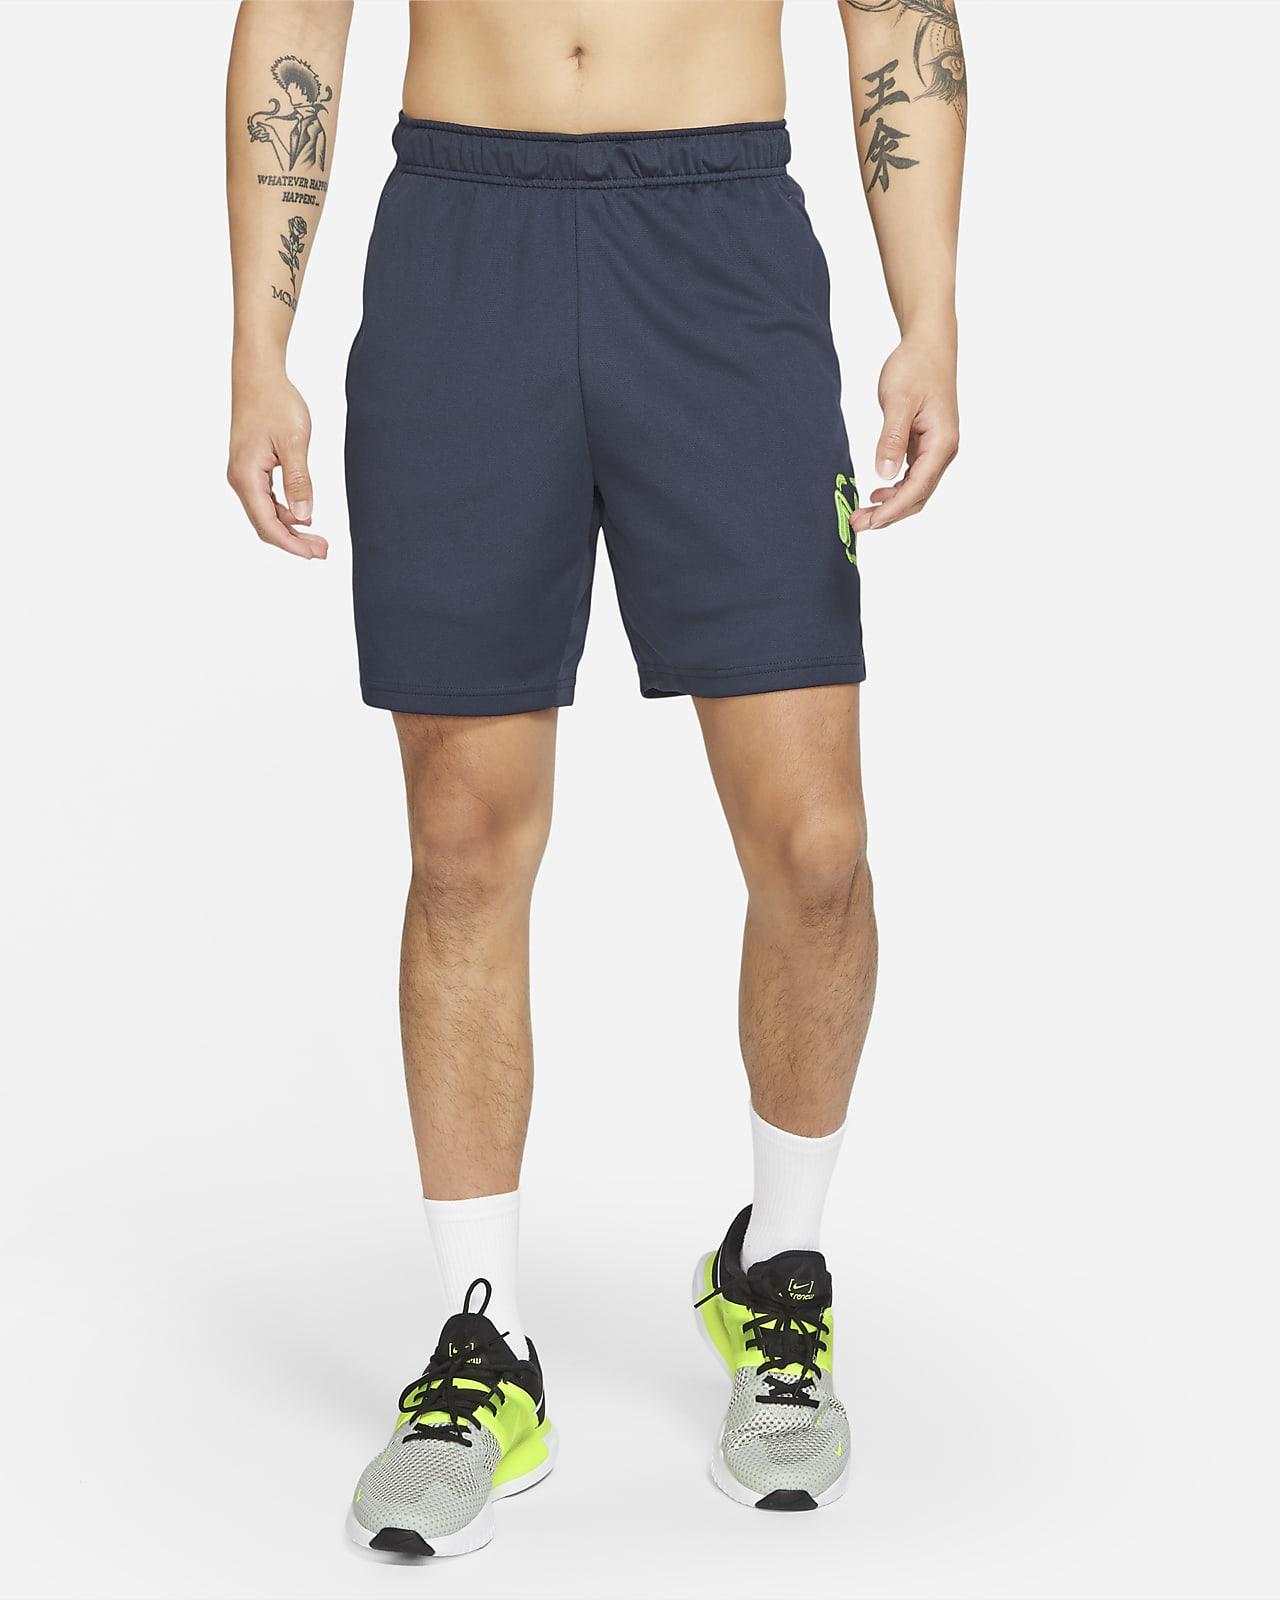 Nike Dri-FIT Men's Knit Graphic Training Shorts